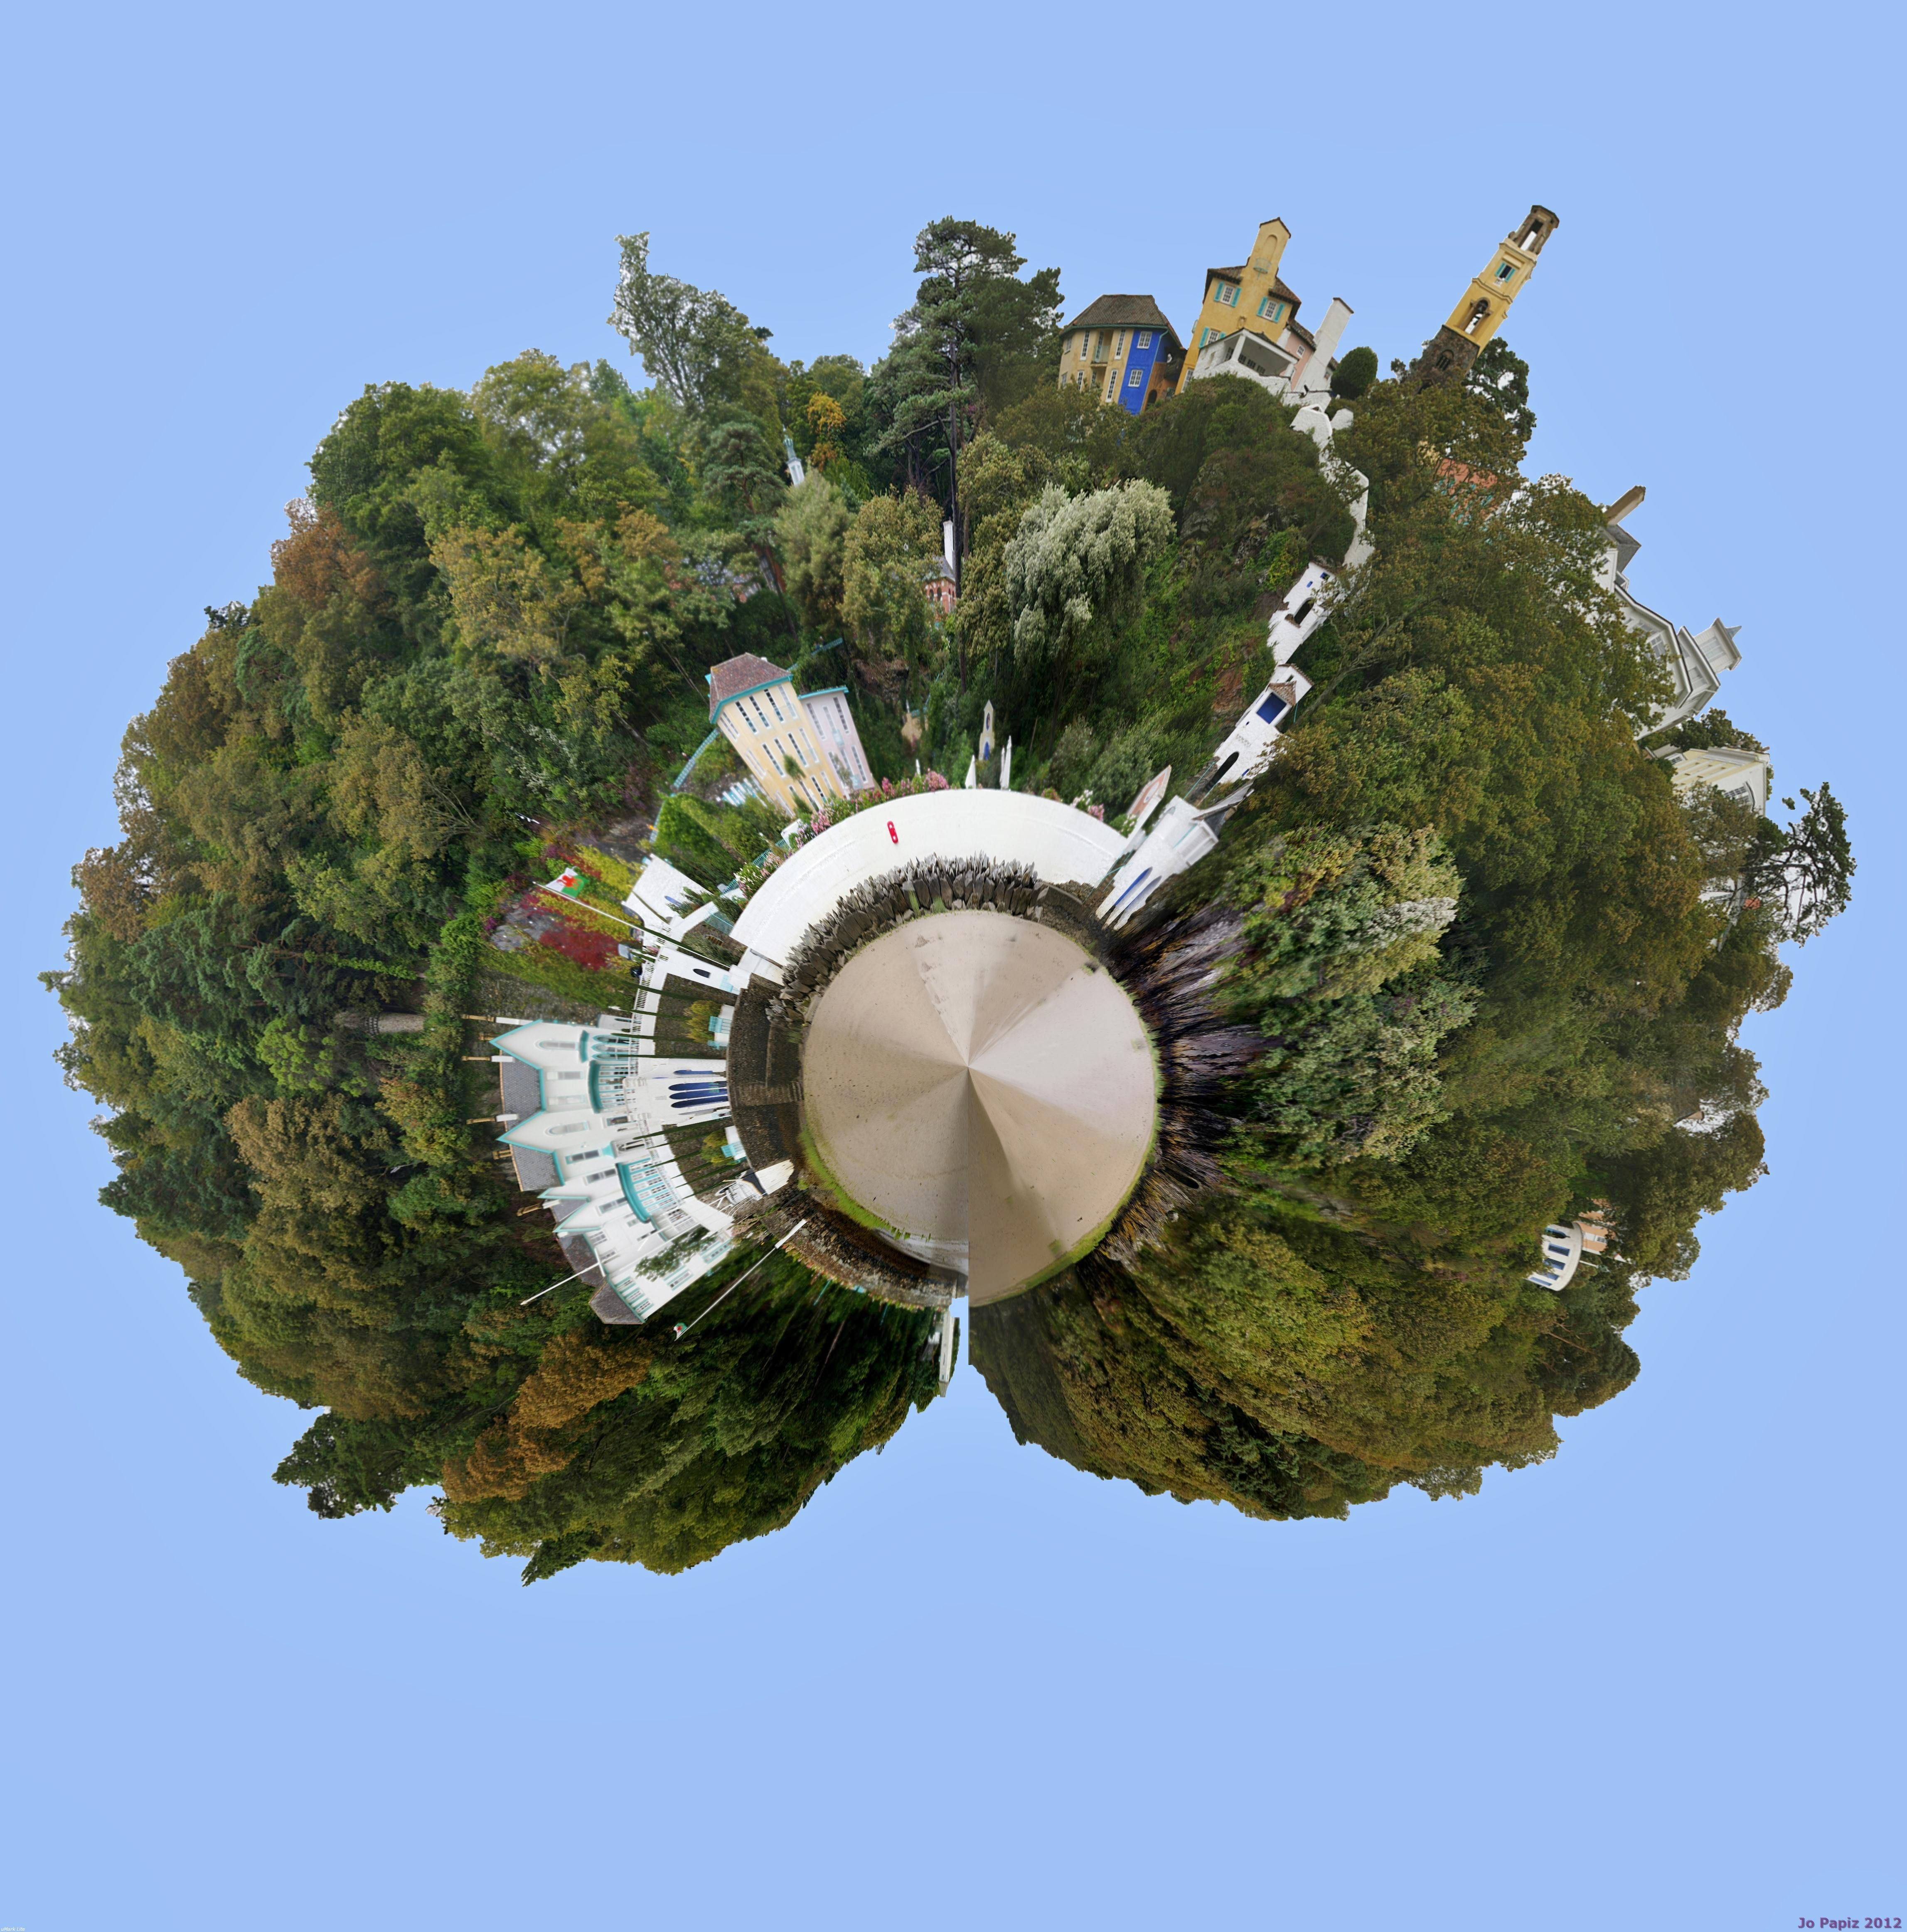 Portmerion Tiny Fair grounds, Travel